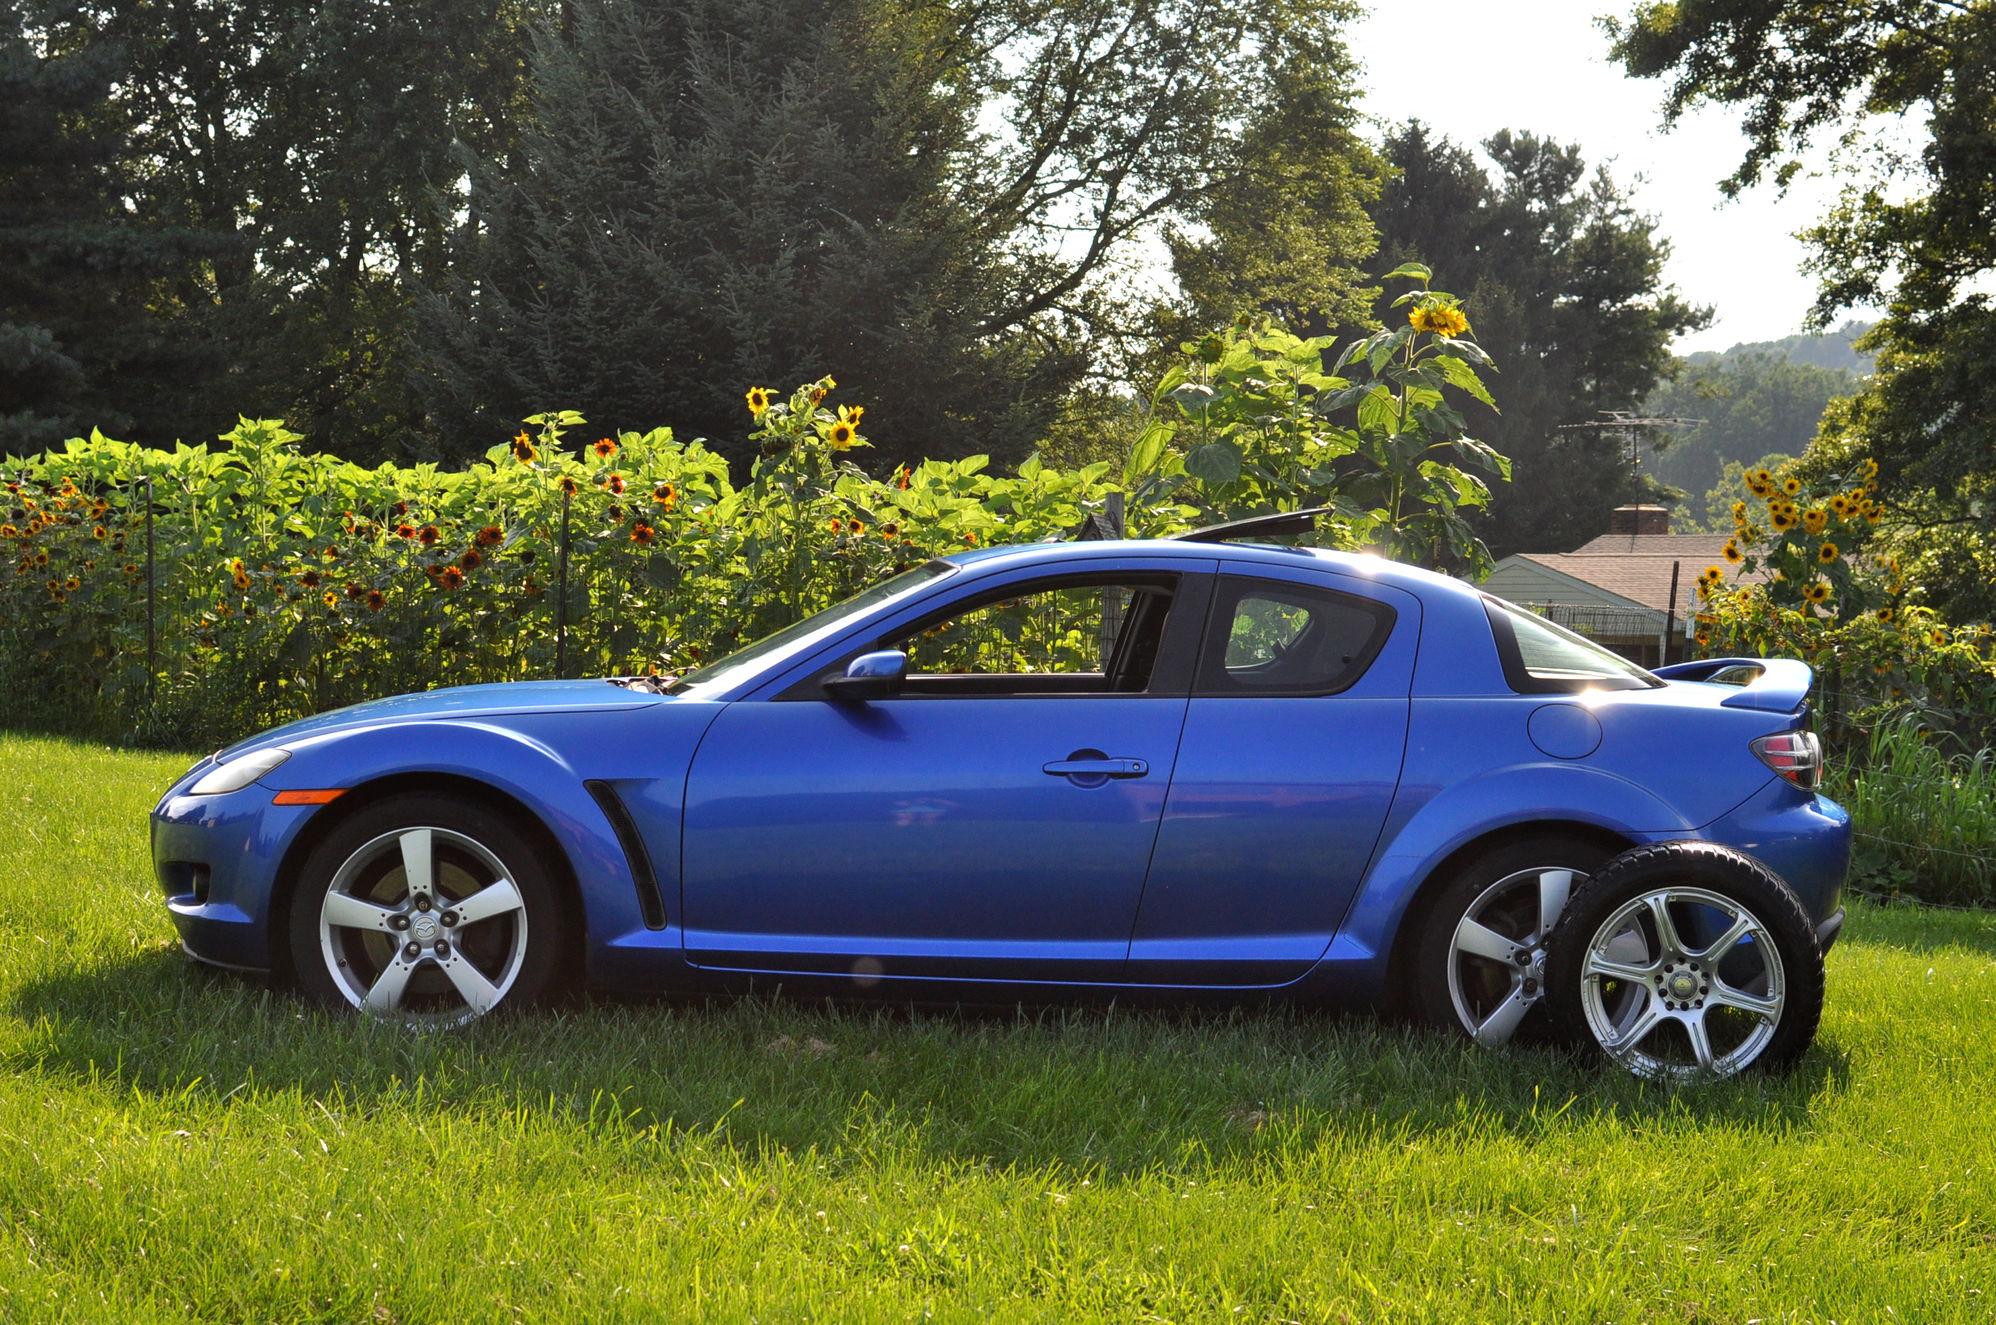 Diy Mazda Rx8 Clutch Adjustment 2005 Rx 8 Engine Diagram Full Album Of Photos Here 2004 For Sale On Imgur